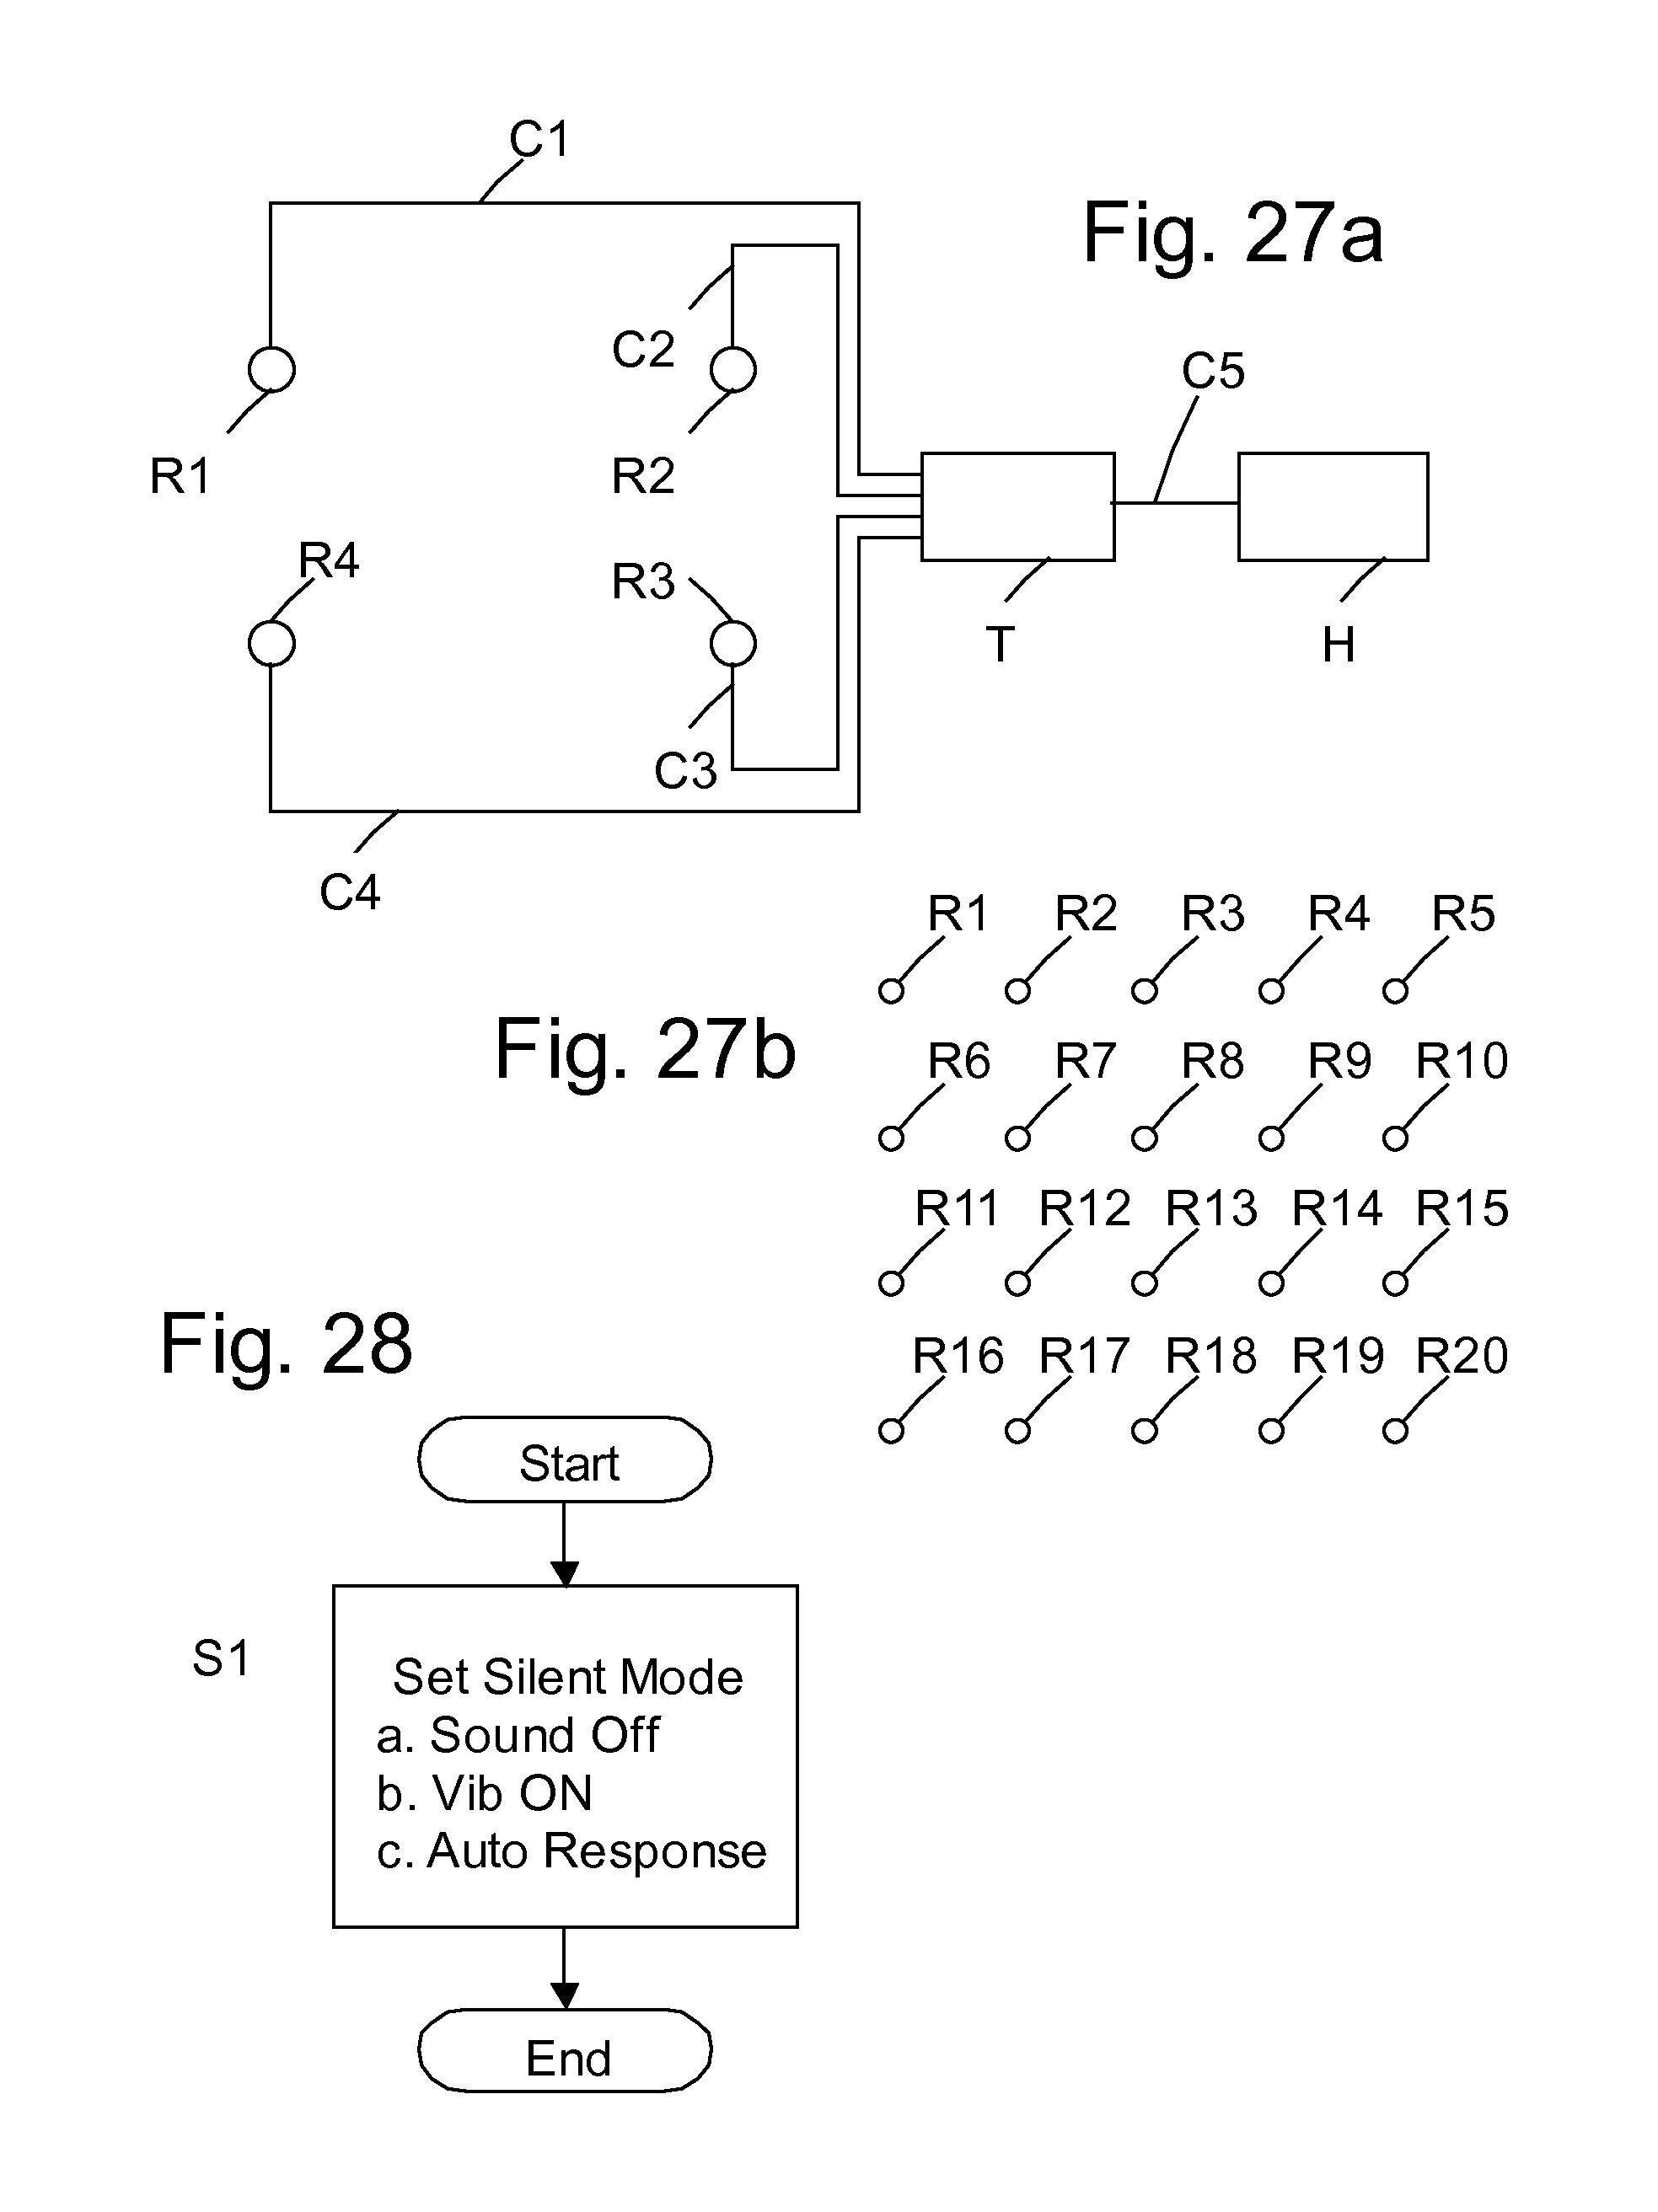 Patent US 8,024,009 B1